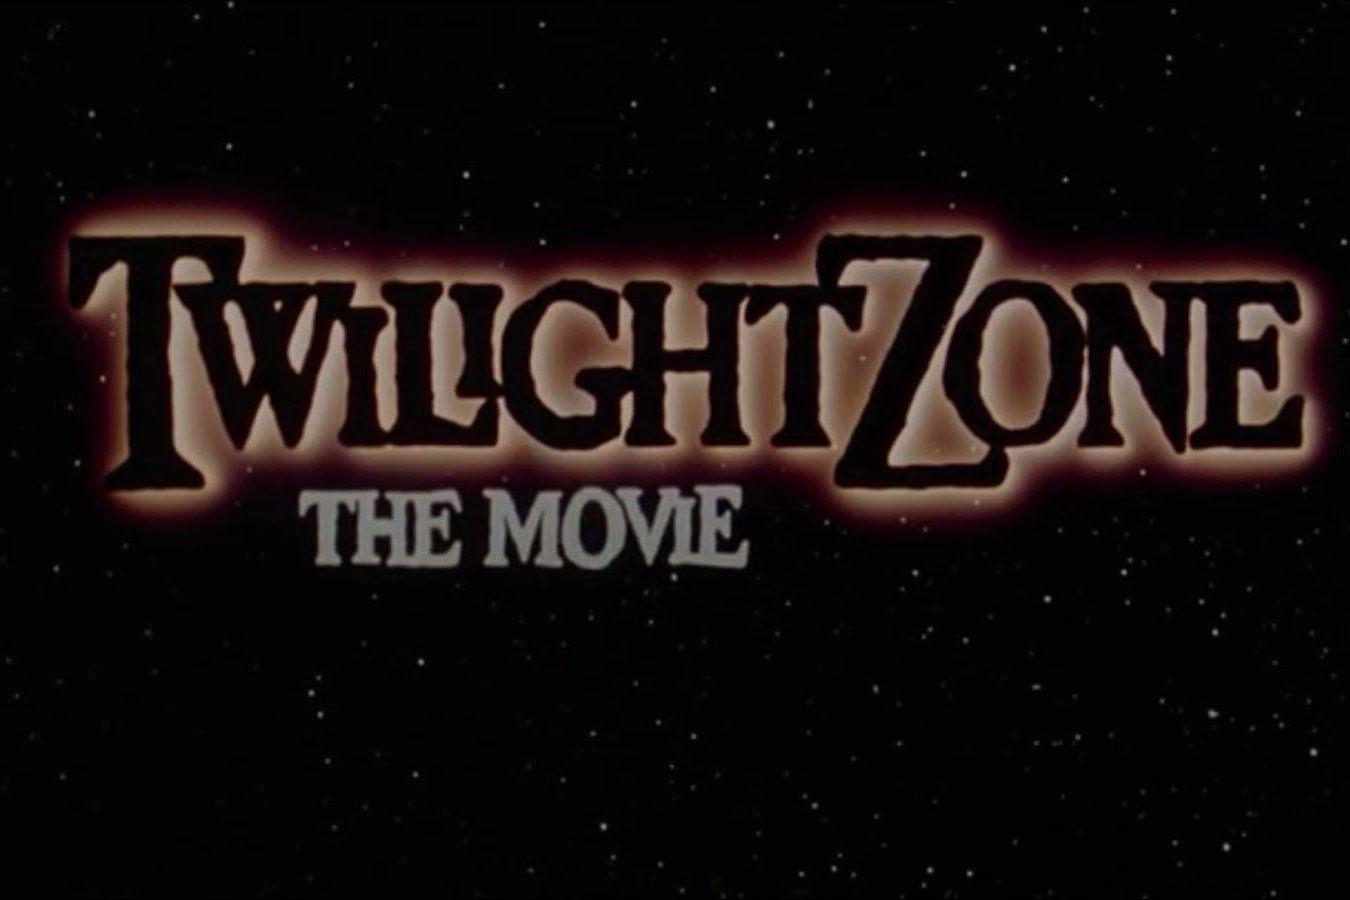 Twilight Zone The Movie poster